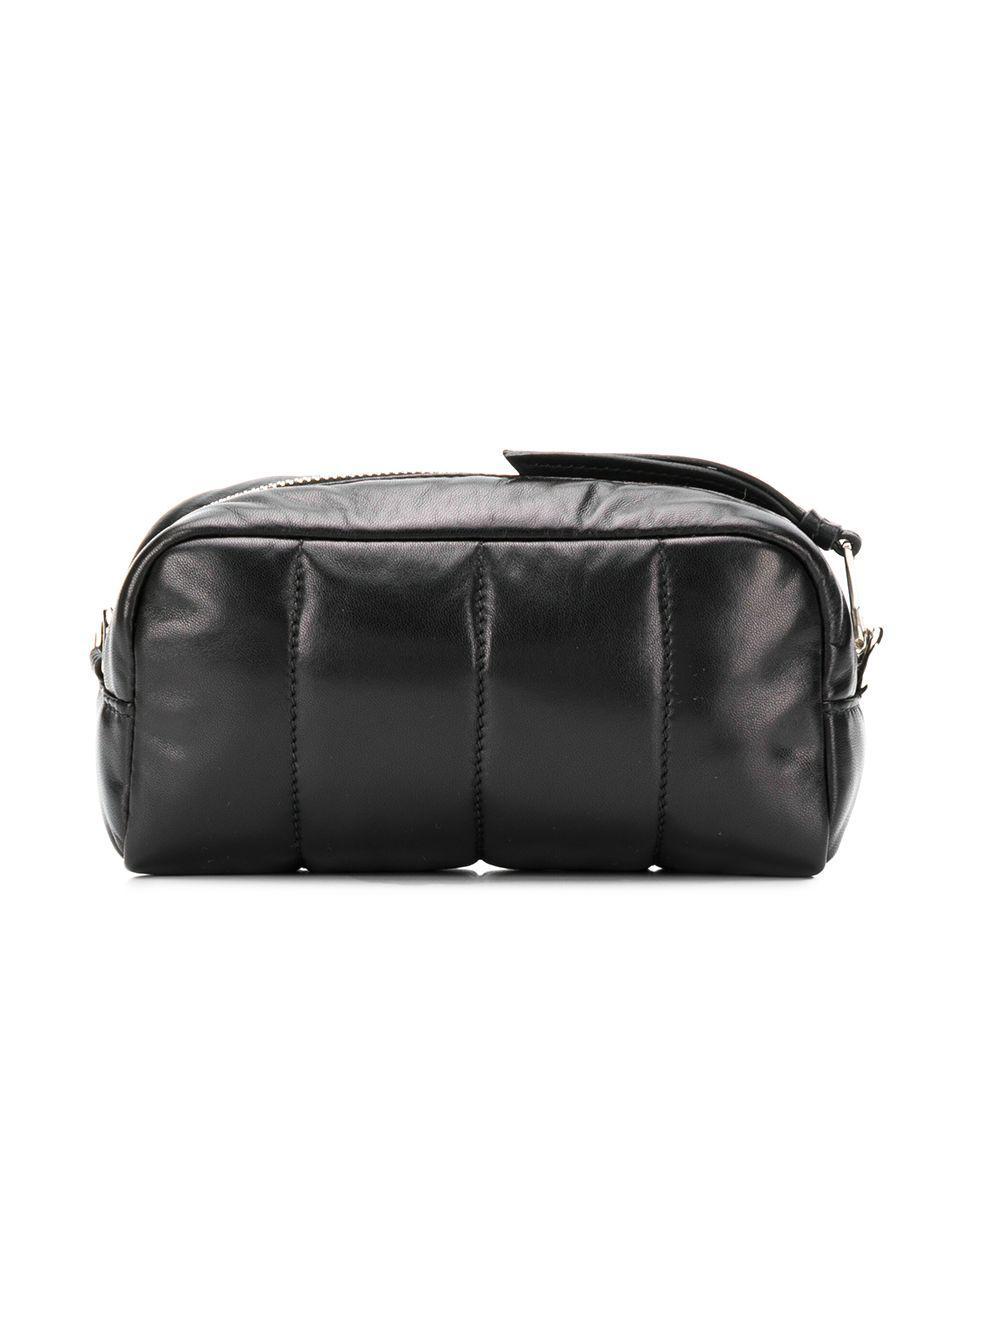 1a1eea6157 Lyst - Prada Logo Plaque Makeup Bag in Black